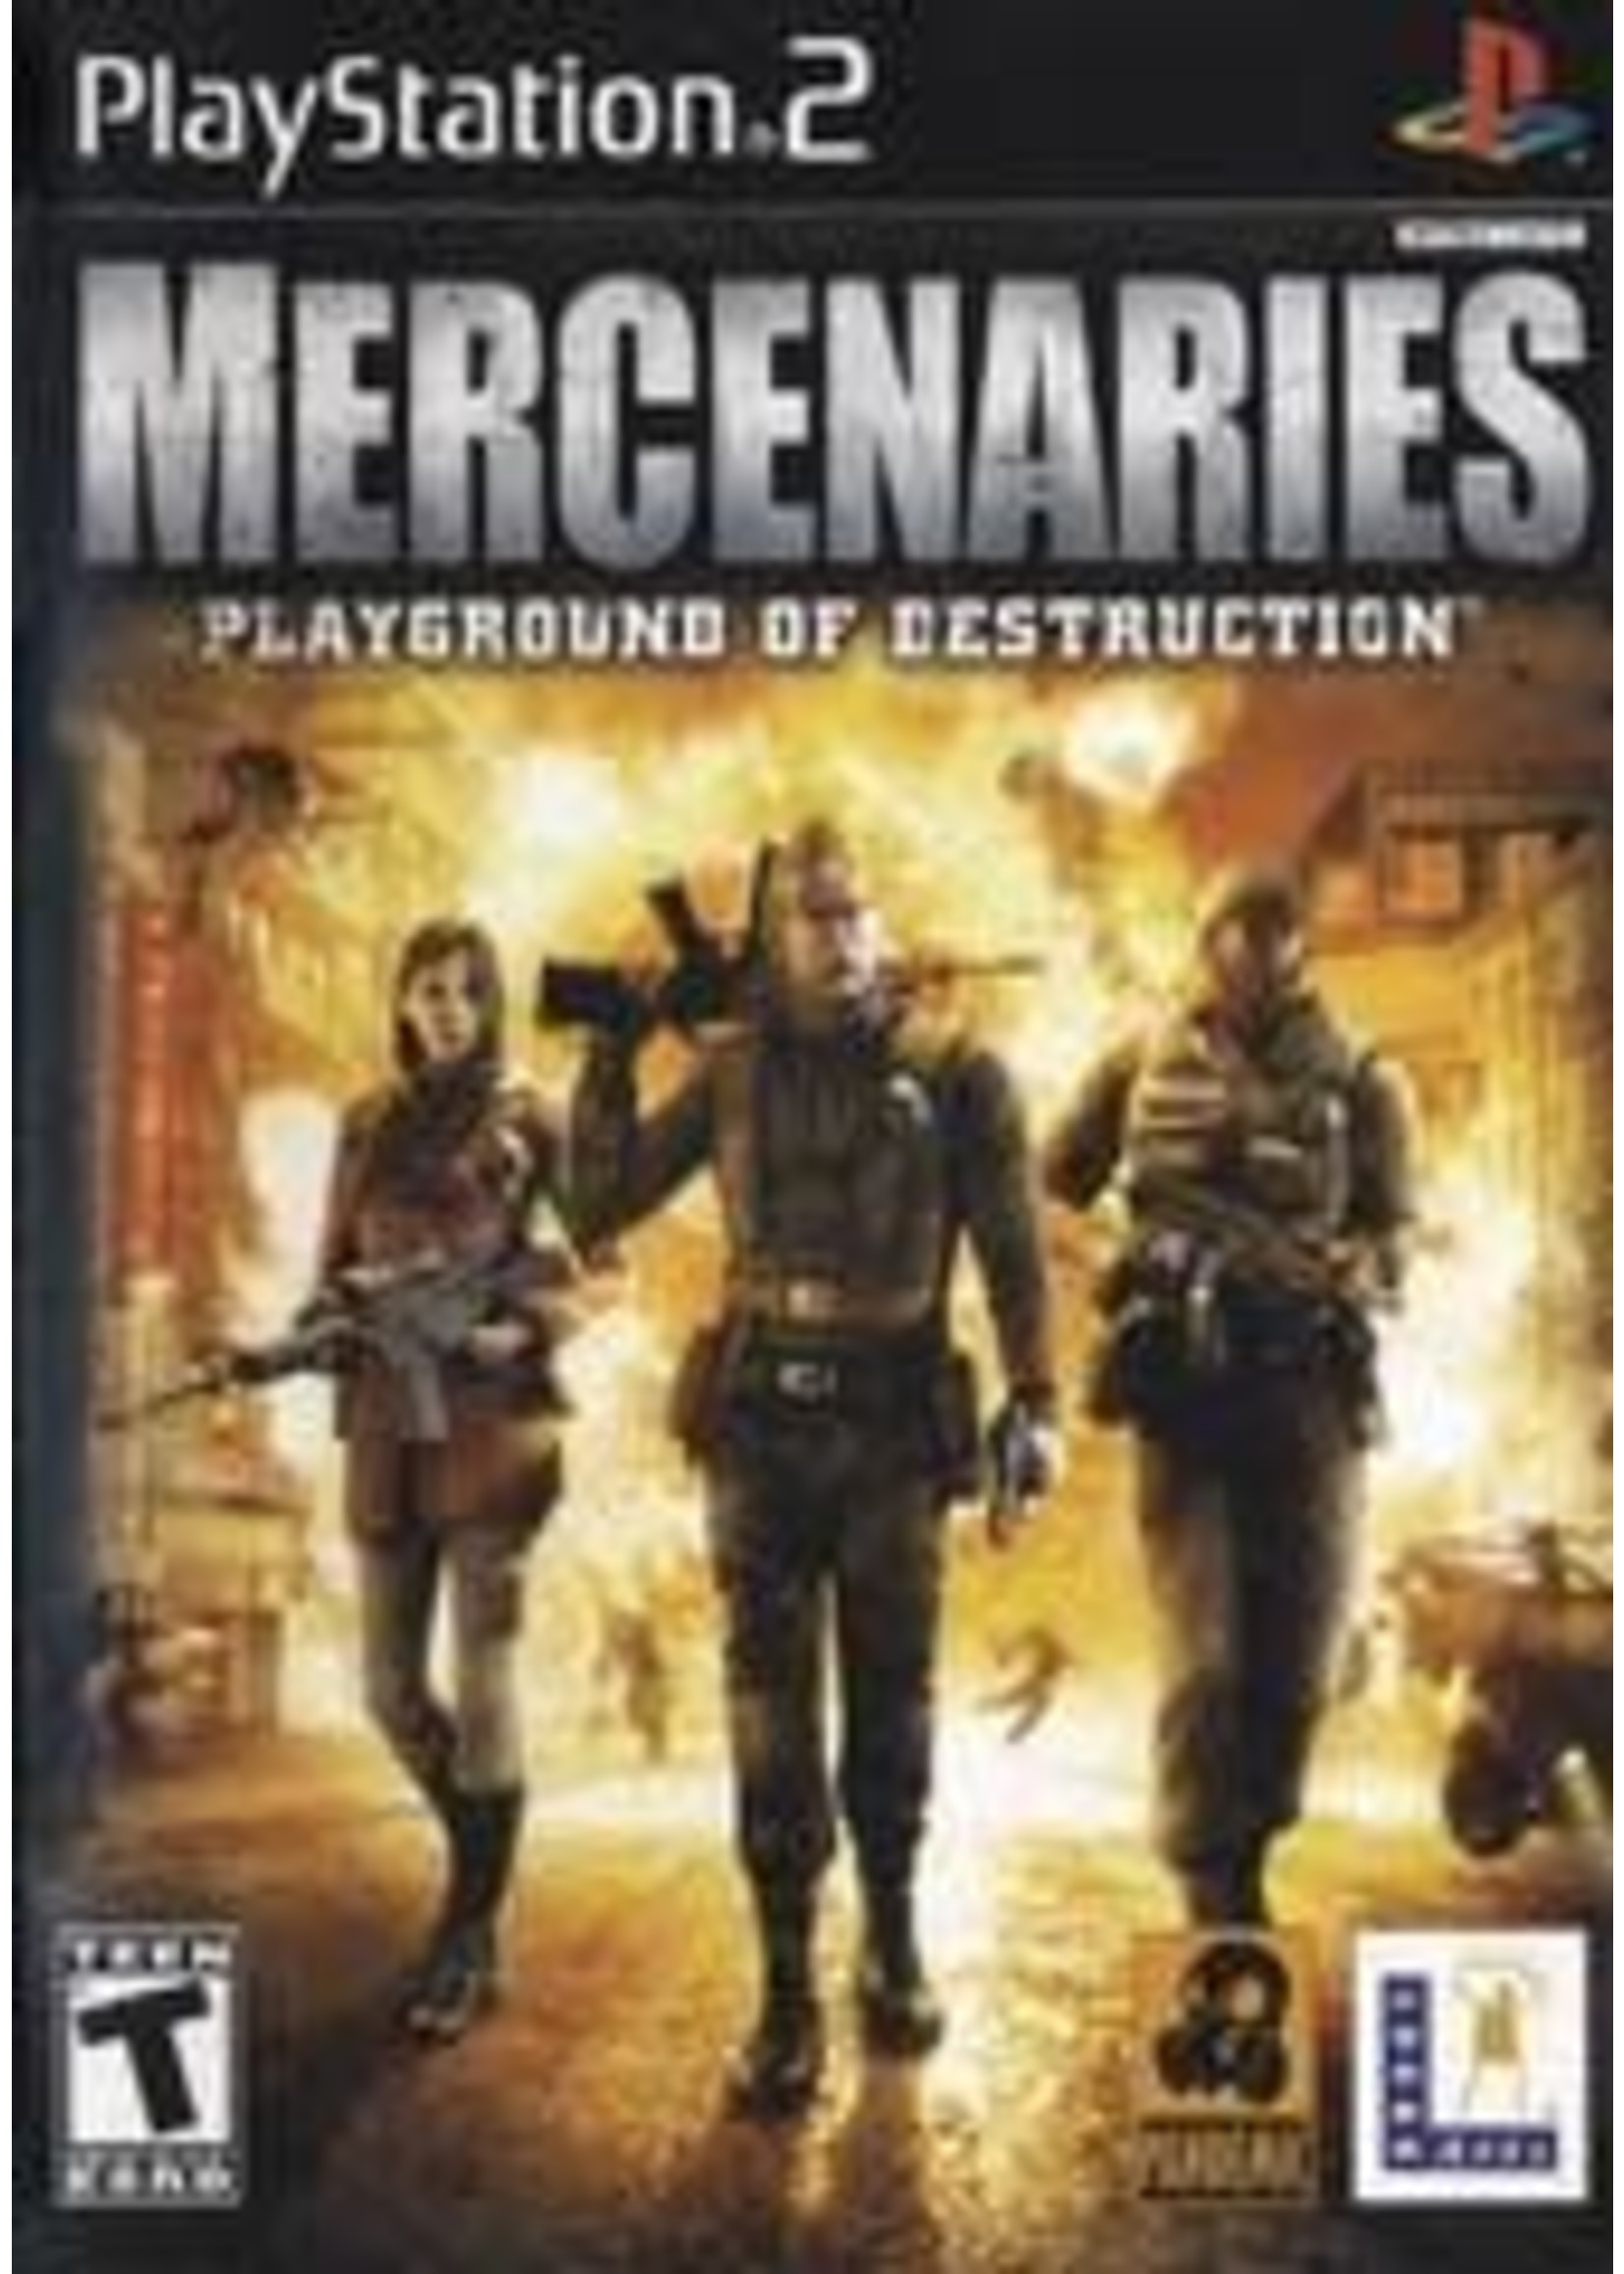 Mercenaries Playstation 2